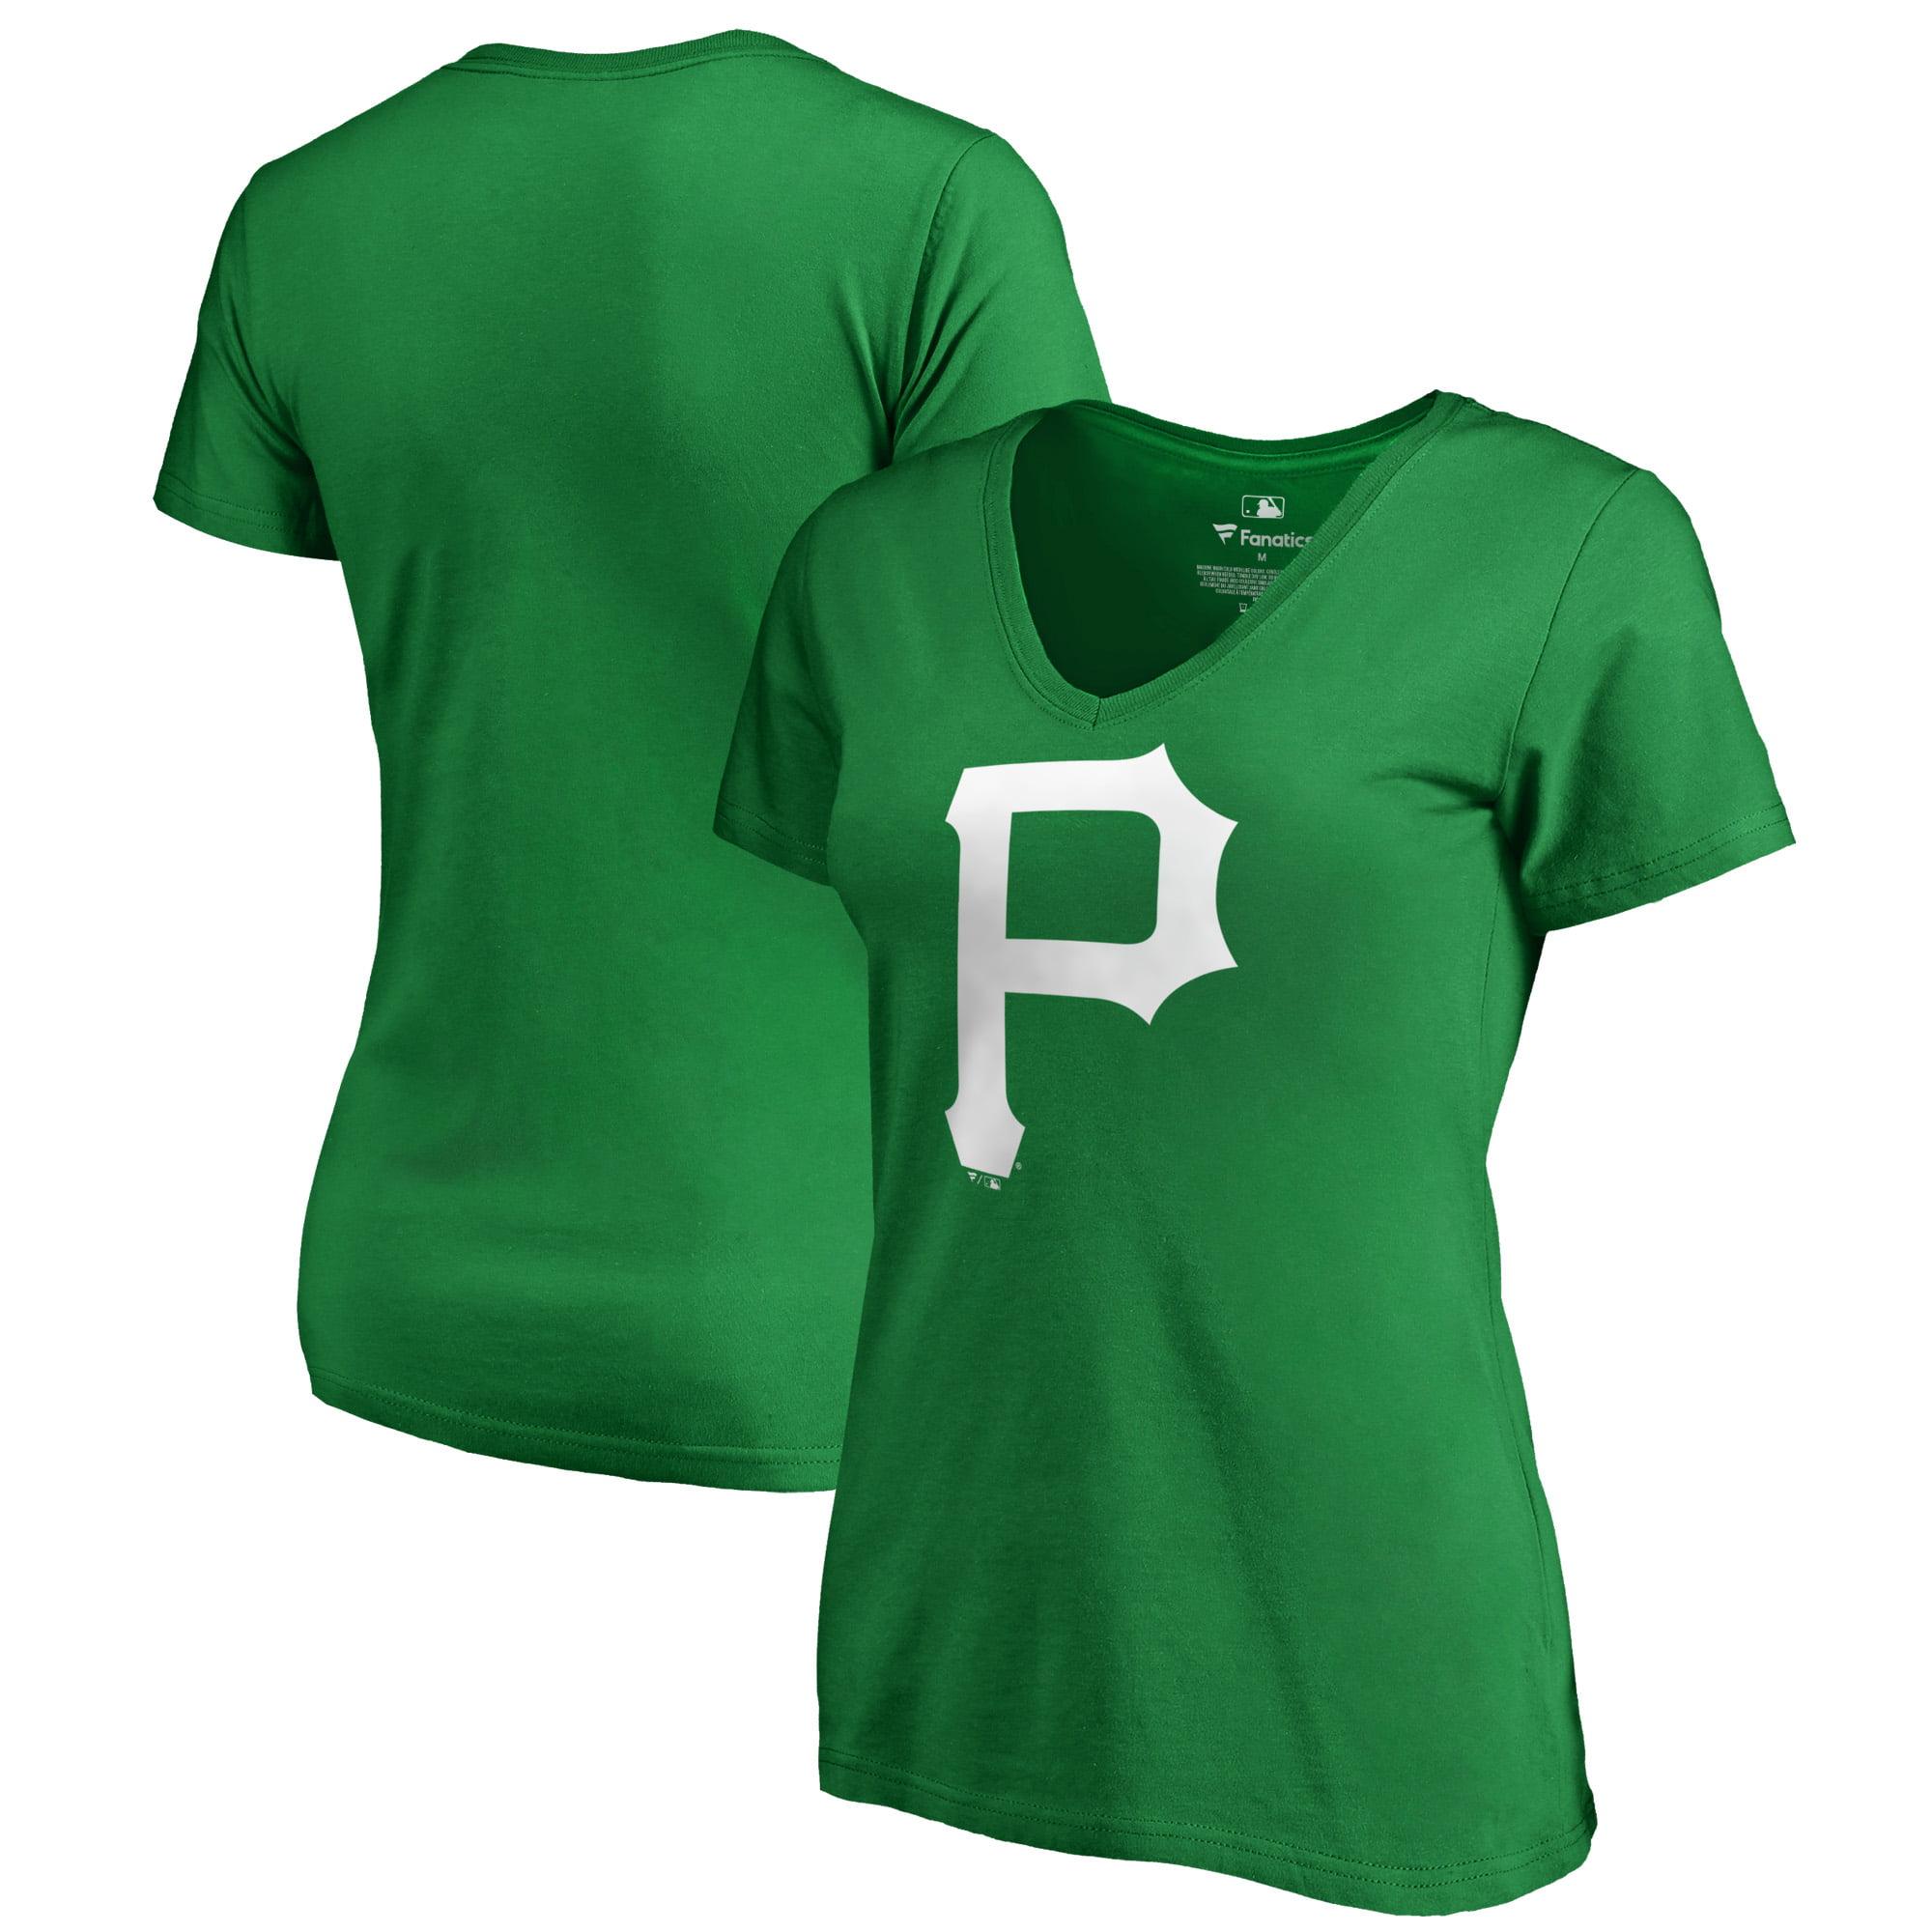 Pittsburgh Pirates Fanatics Branded Women's St. Patrick's Day White Logo Plus Size V-Neck T-Shirt - Kelly Green